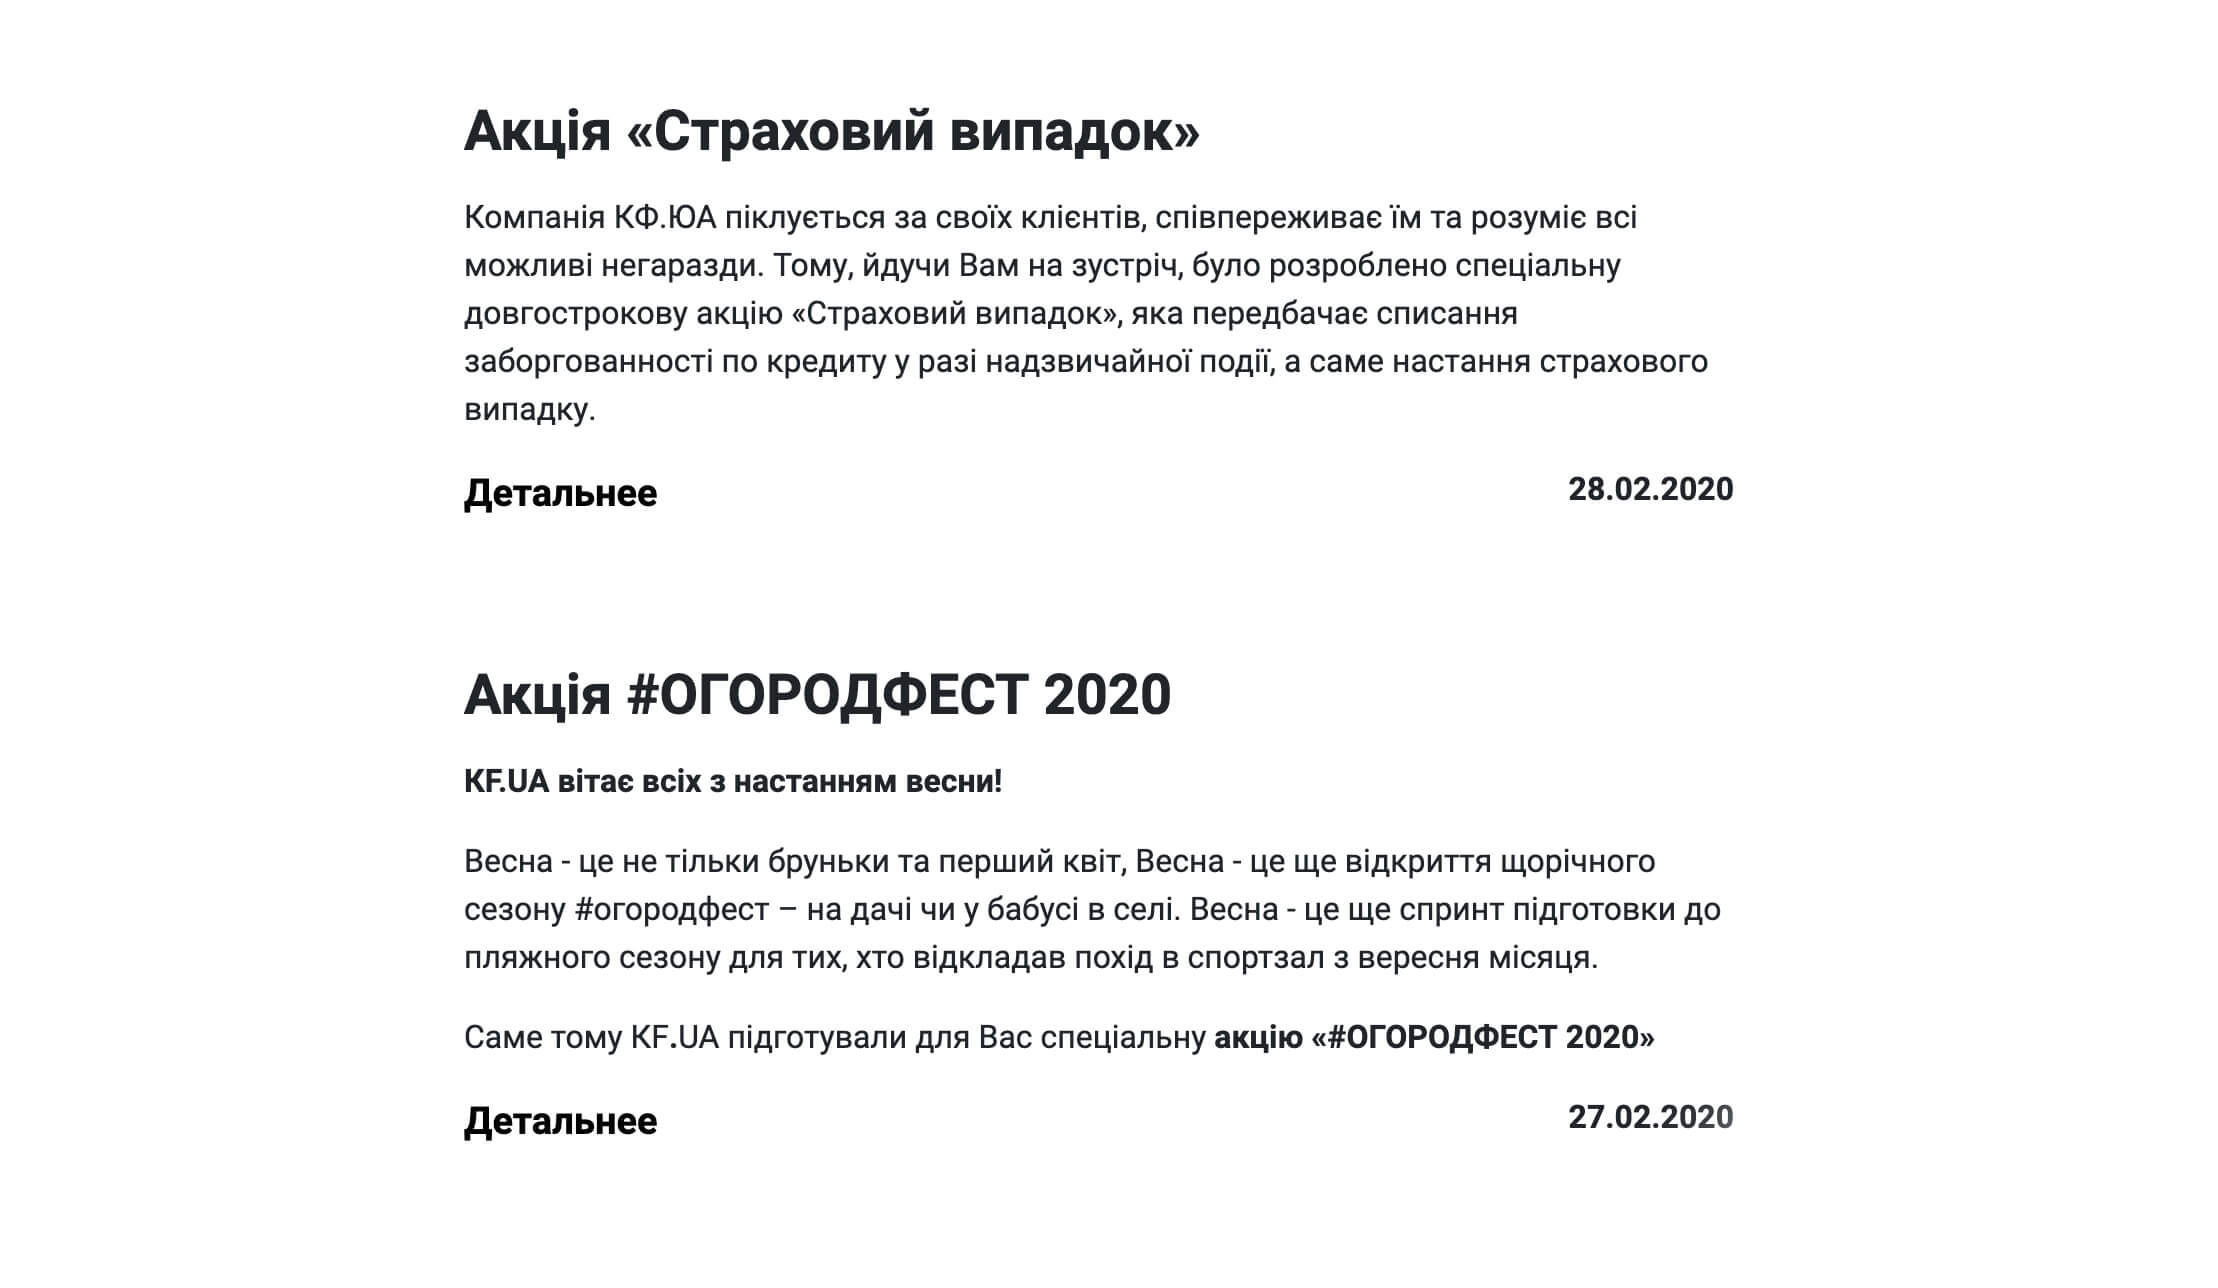 KF.UA акції промокоди